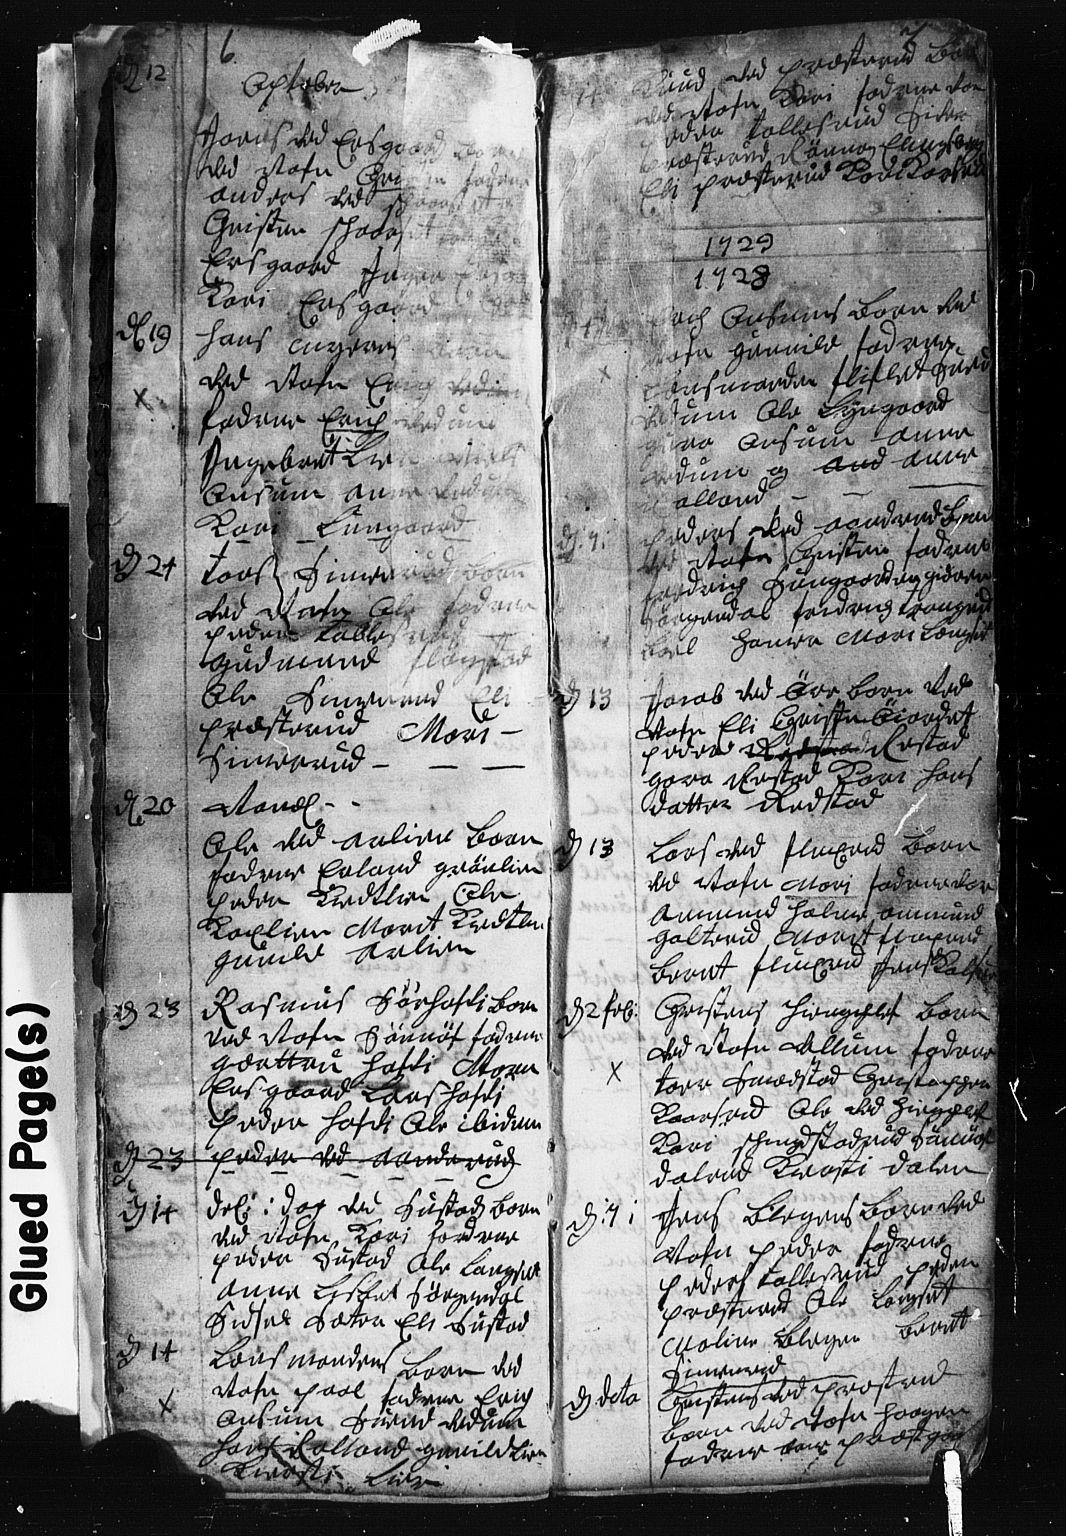 SAH, Fåberg prestekontor, Klokkerbok nr. 1, 1727-1767, s. 6-7